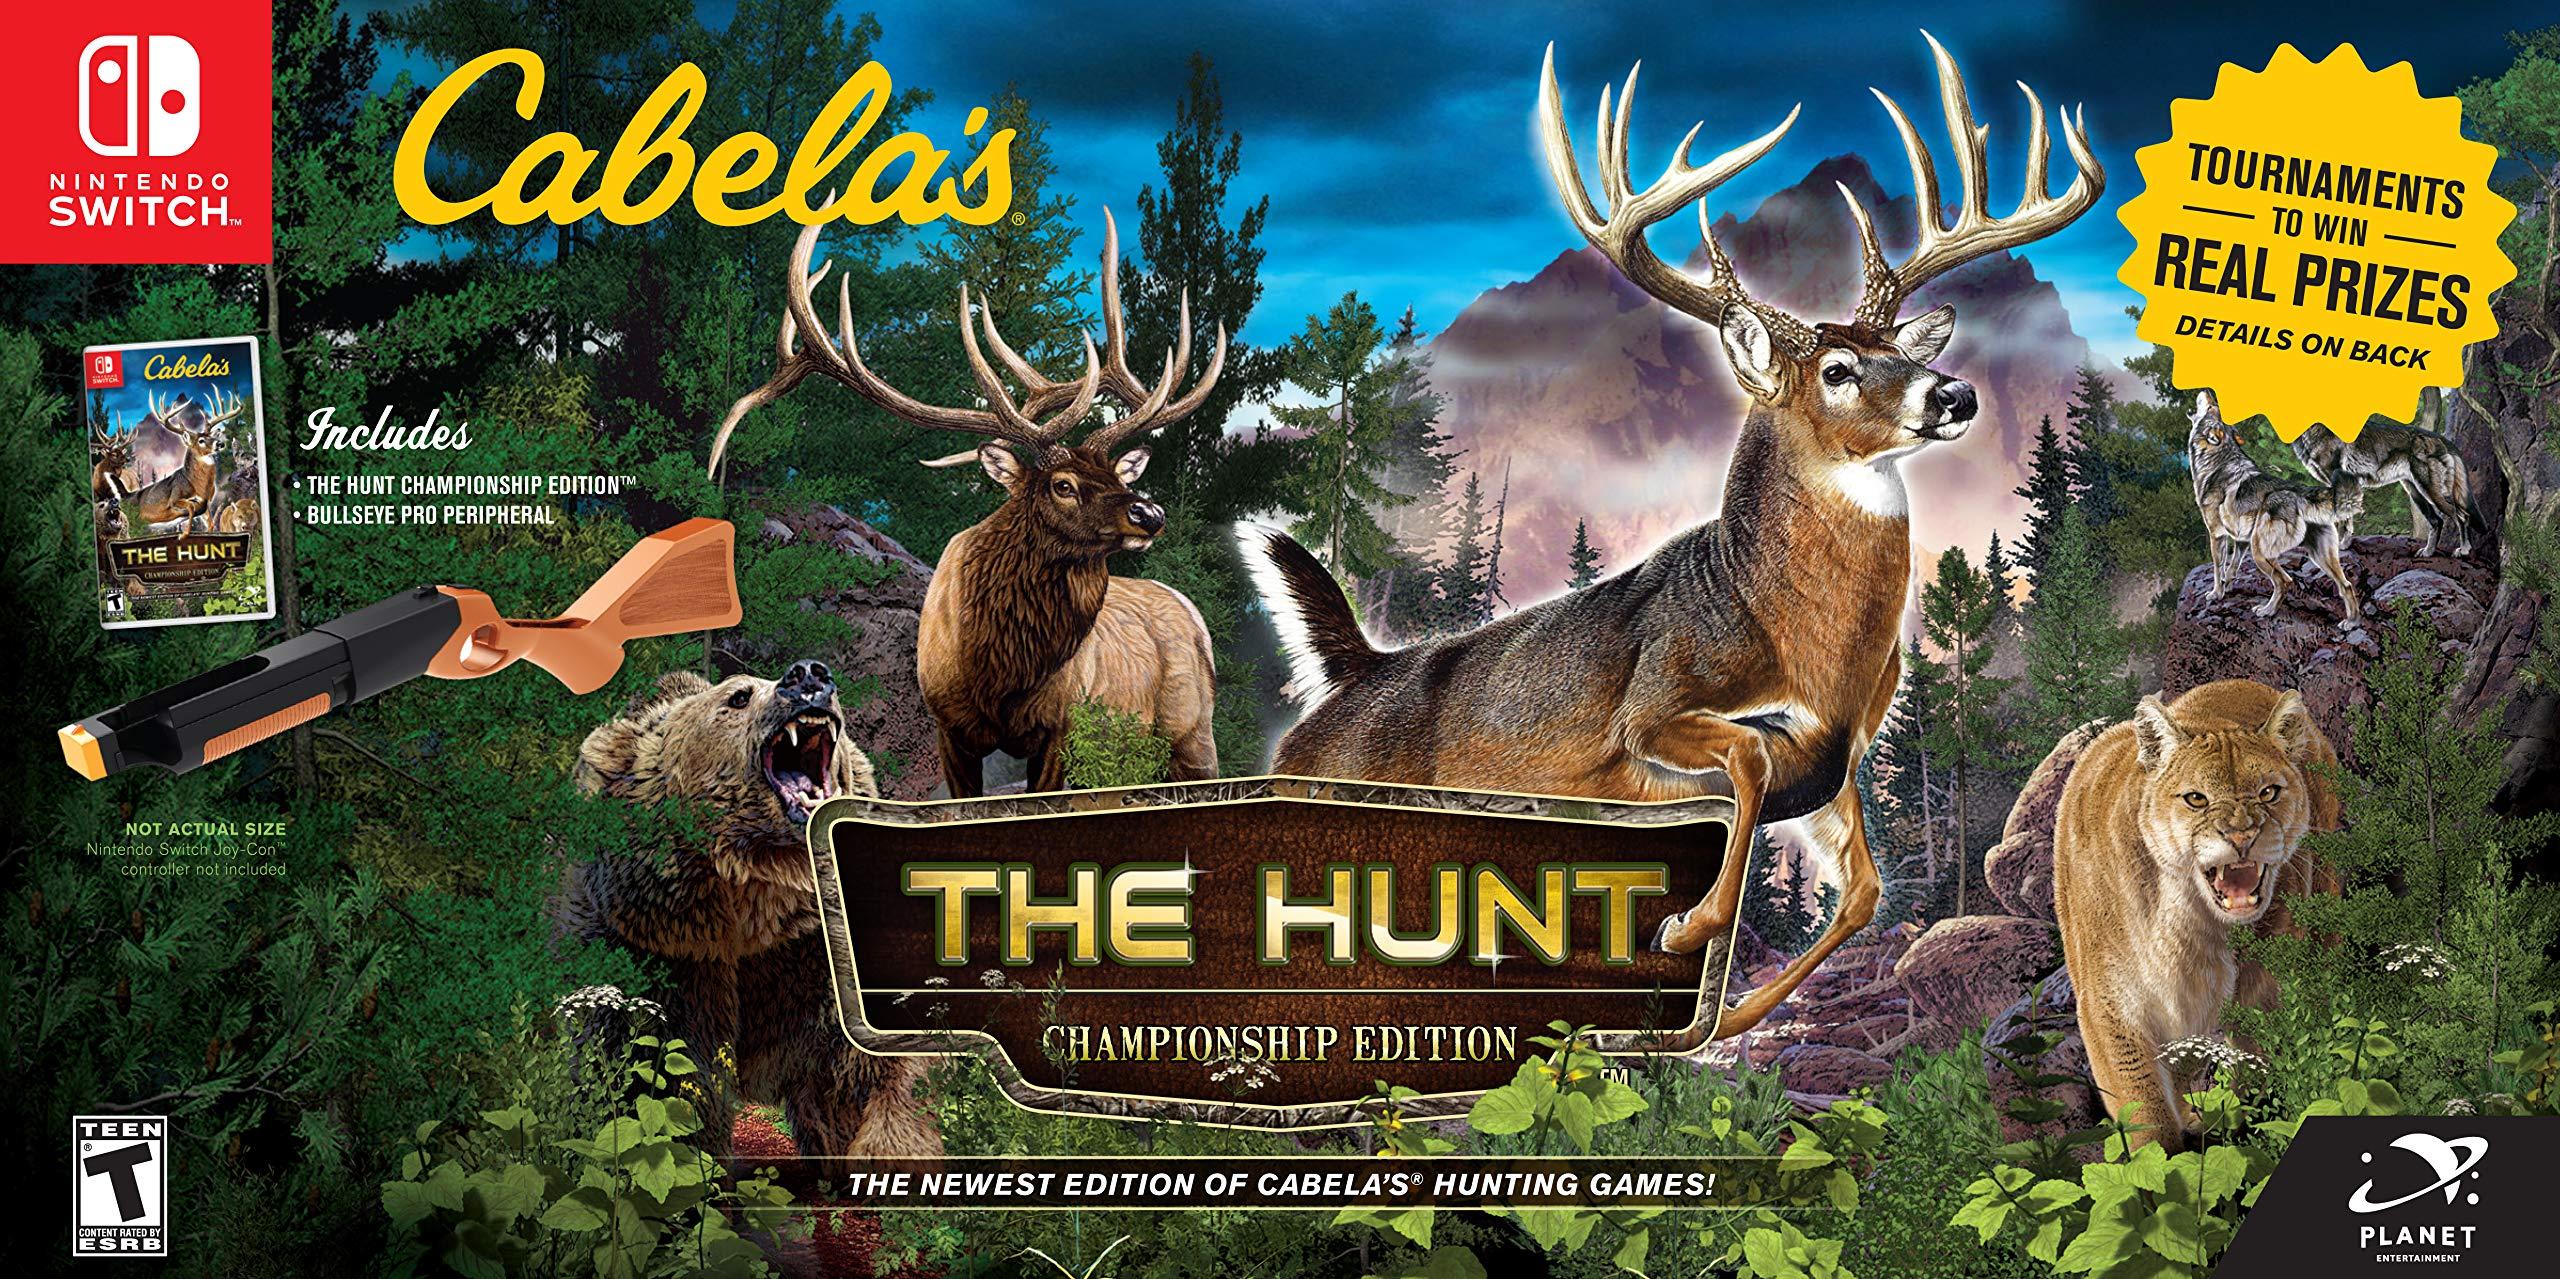 Cabela's: The Hunt Championship Edition